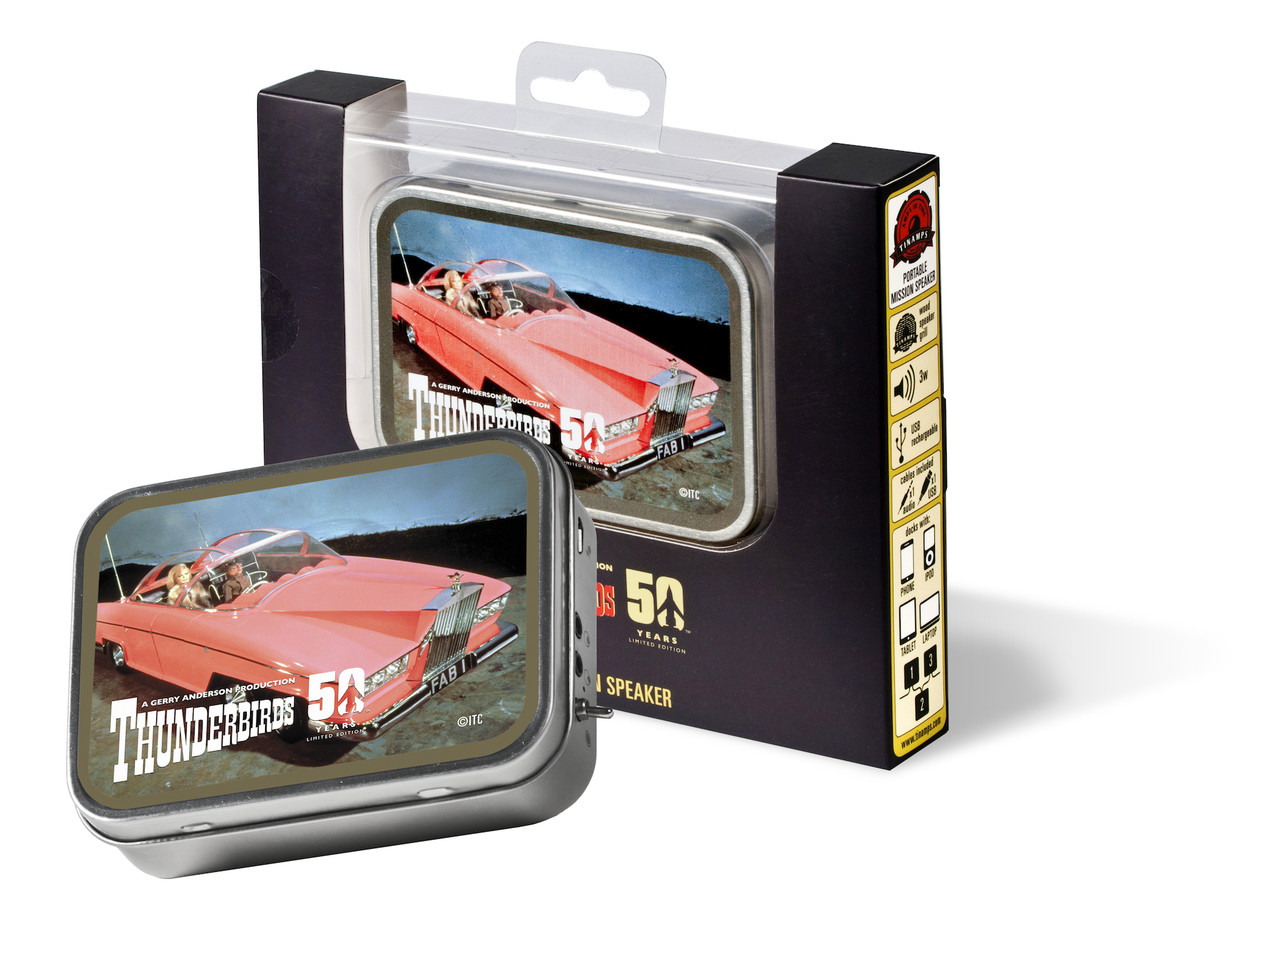 Tinamps Retro Speaker - Thunderbird FAB1 Limited Edition